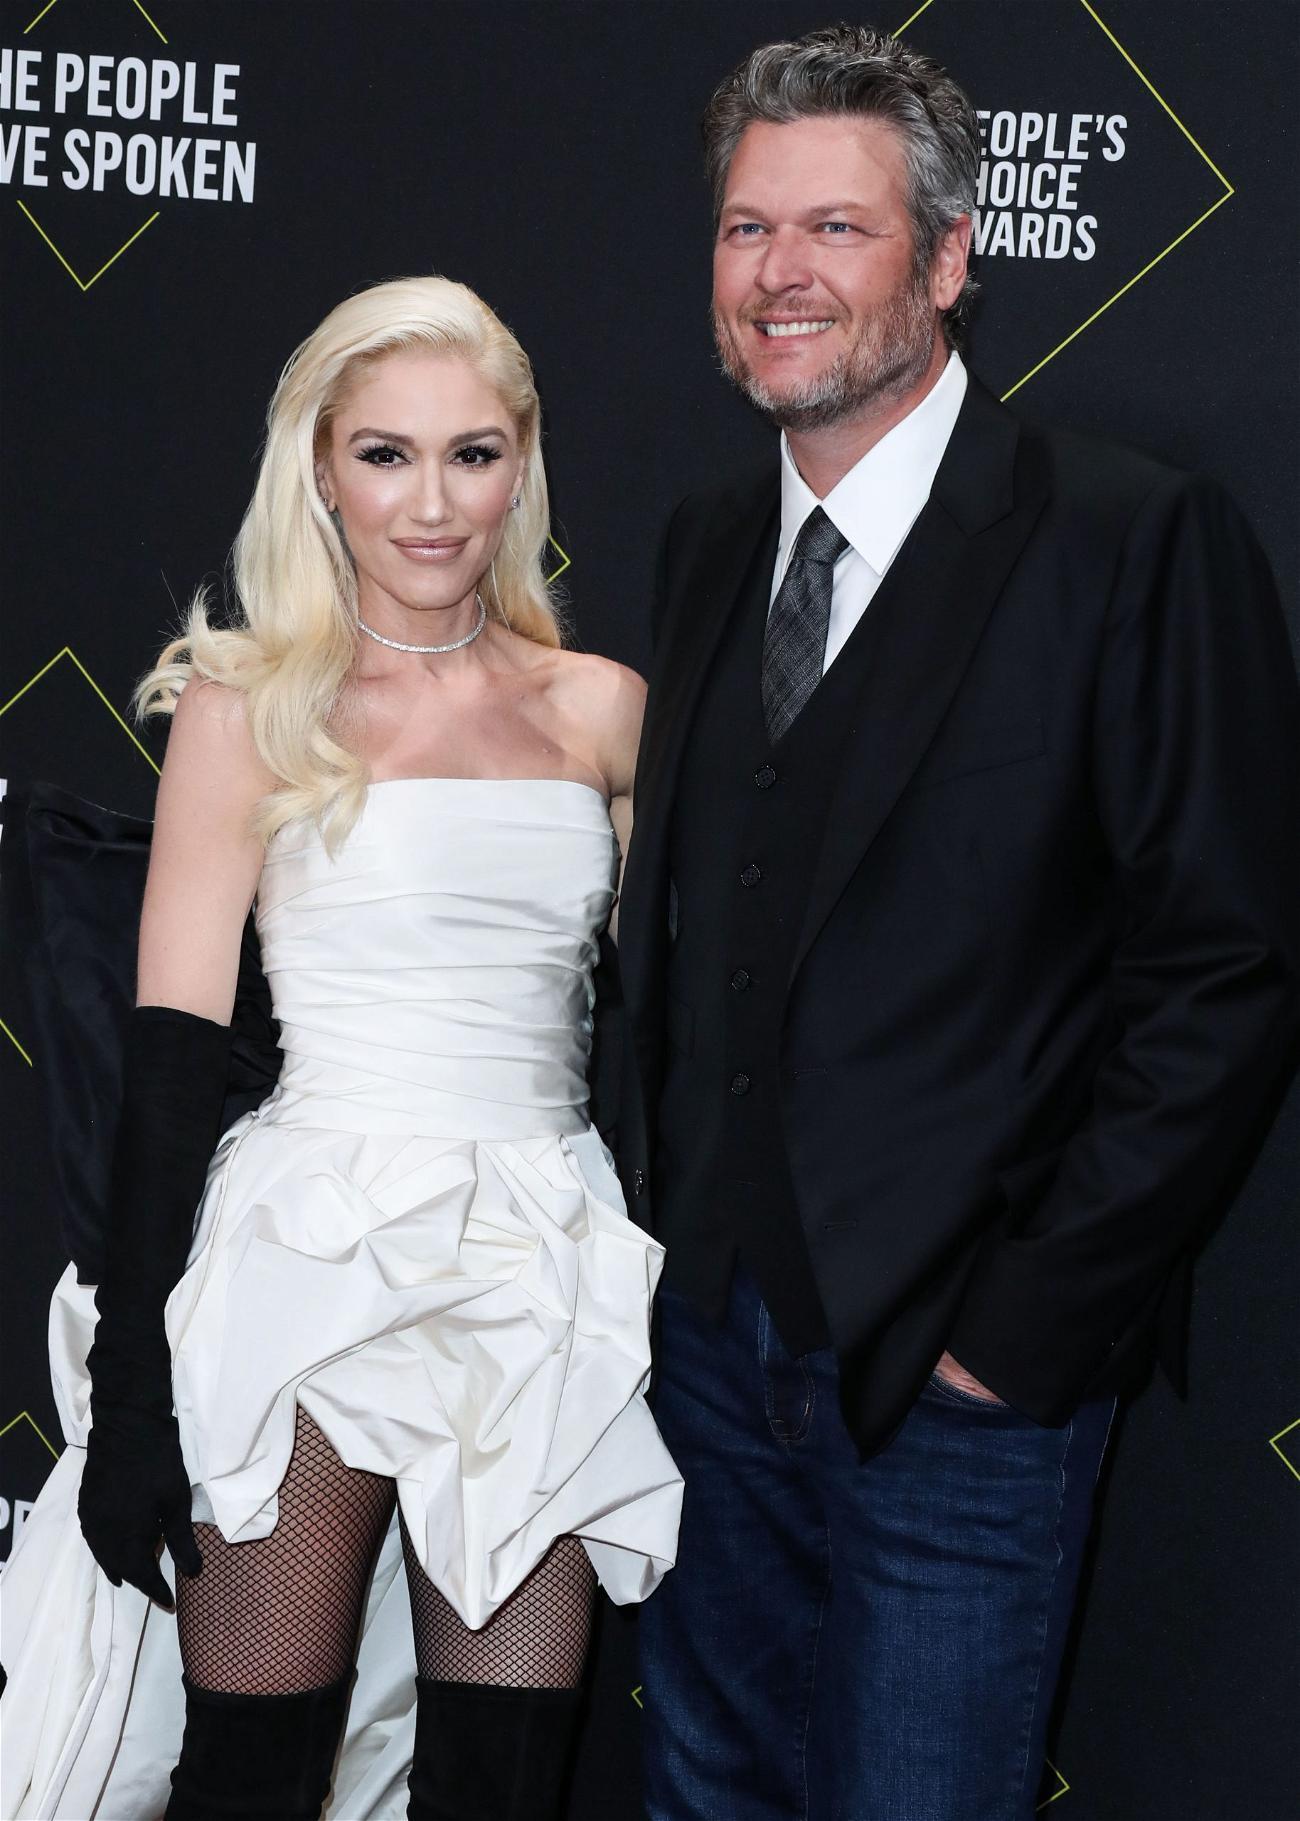 Gwen Stefani And Blake Shelton Getting Married